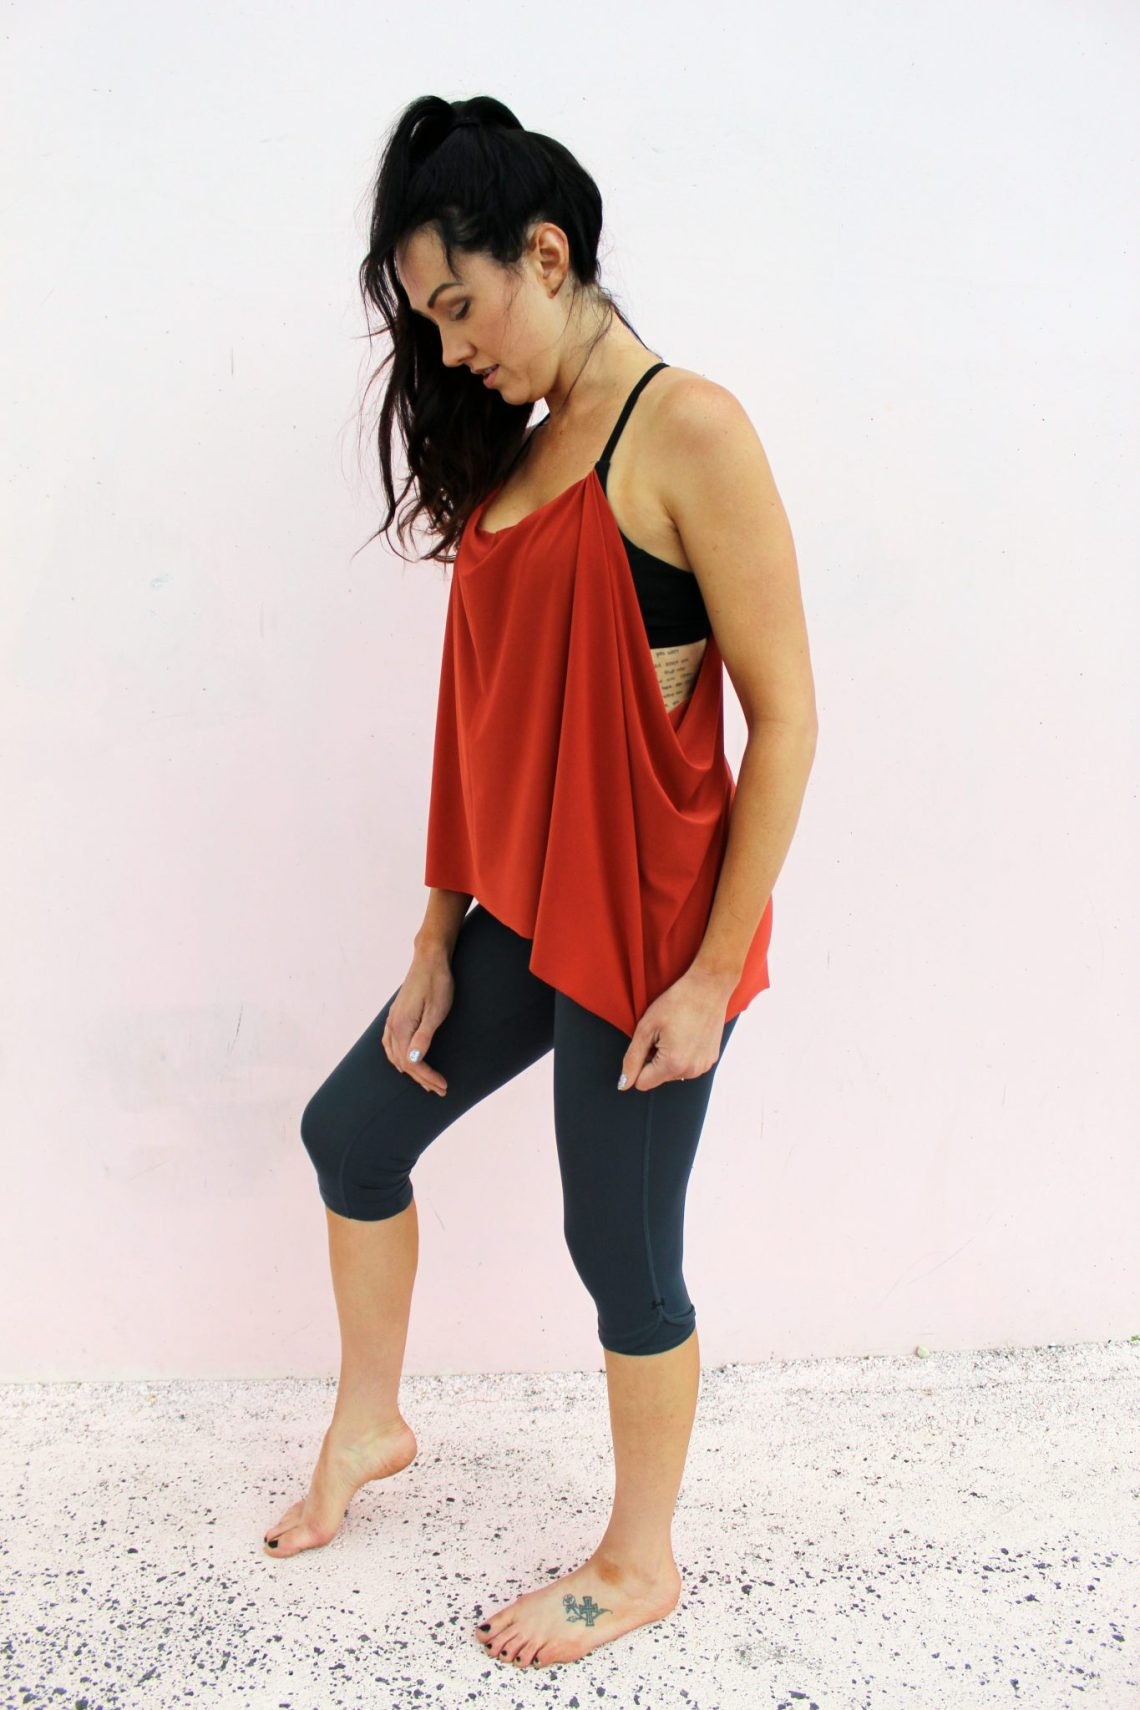 diy workout shirt tutorial . make a lulu lemon knockoff